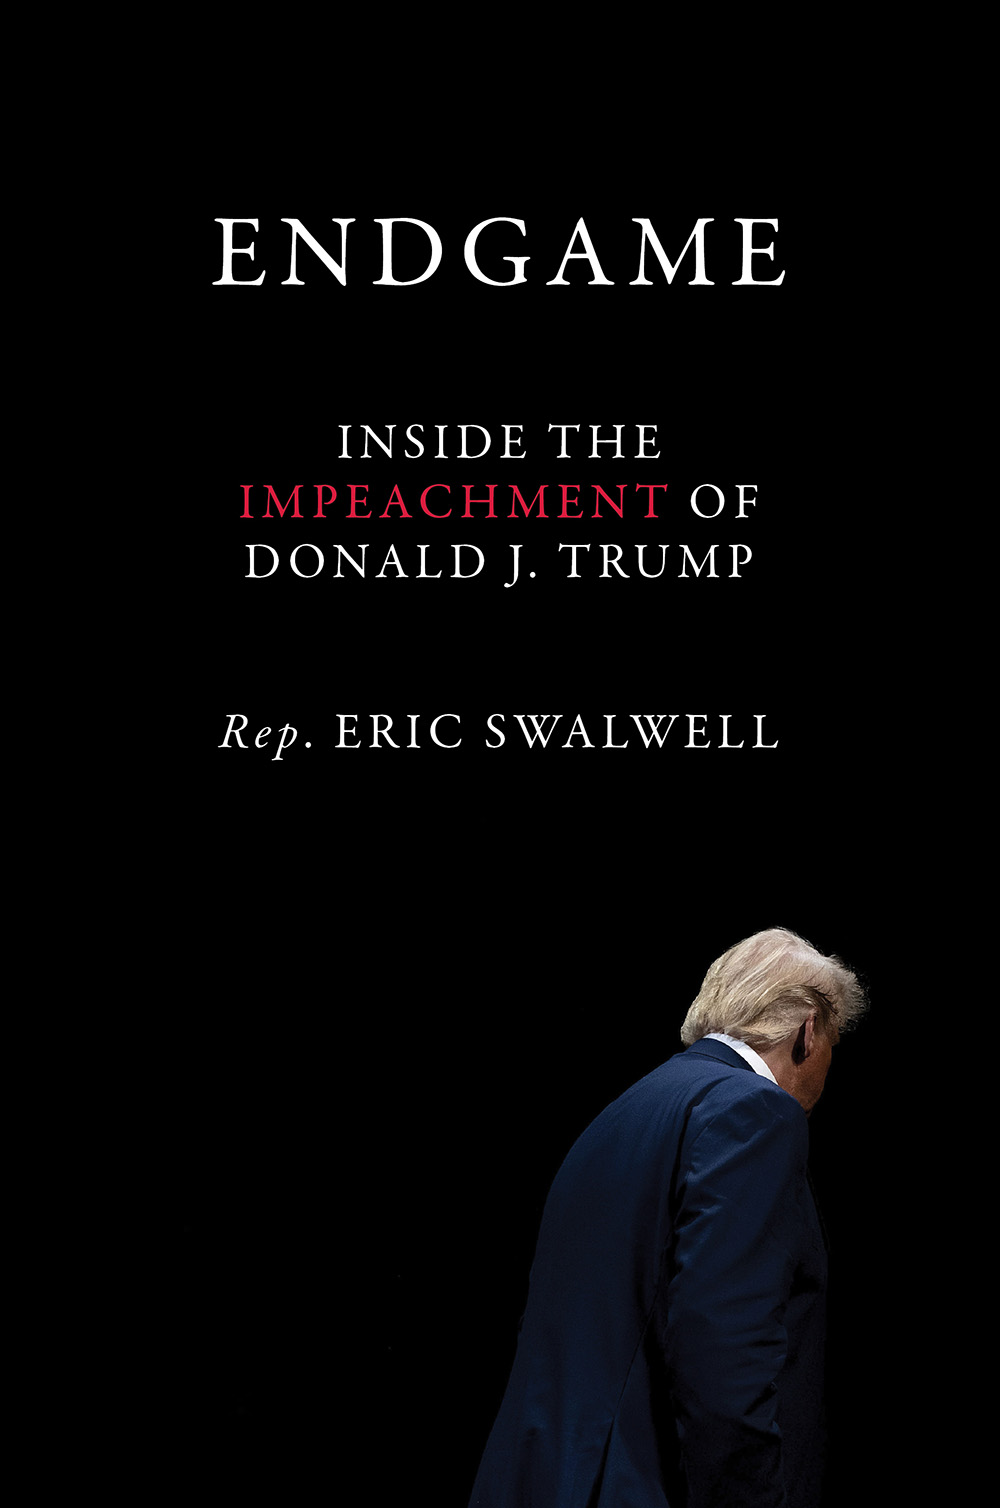 Endgame: Inside the Impeachment of Donald J. Trump